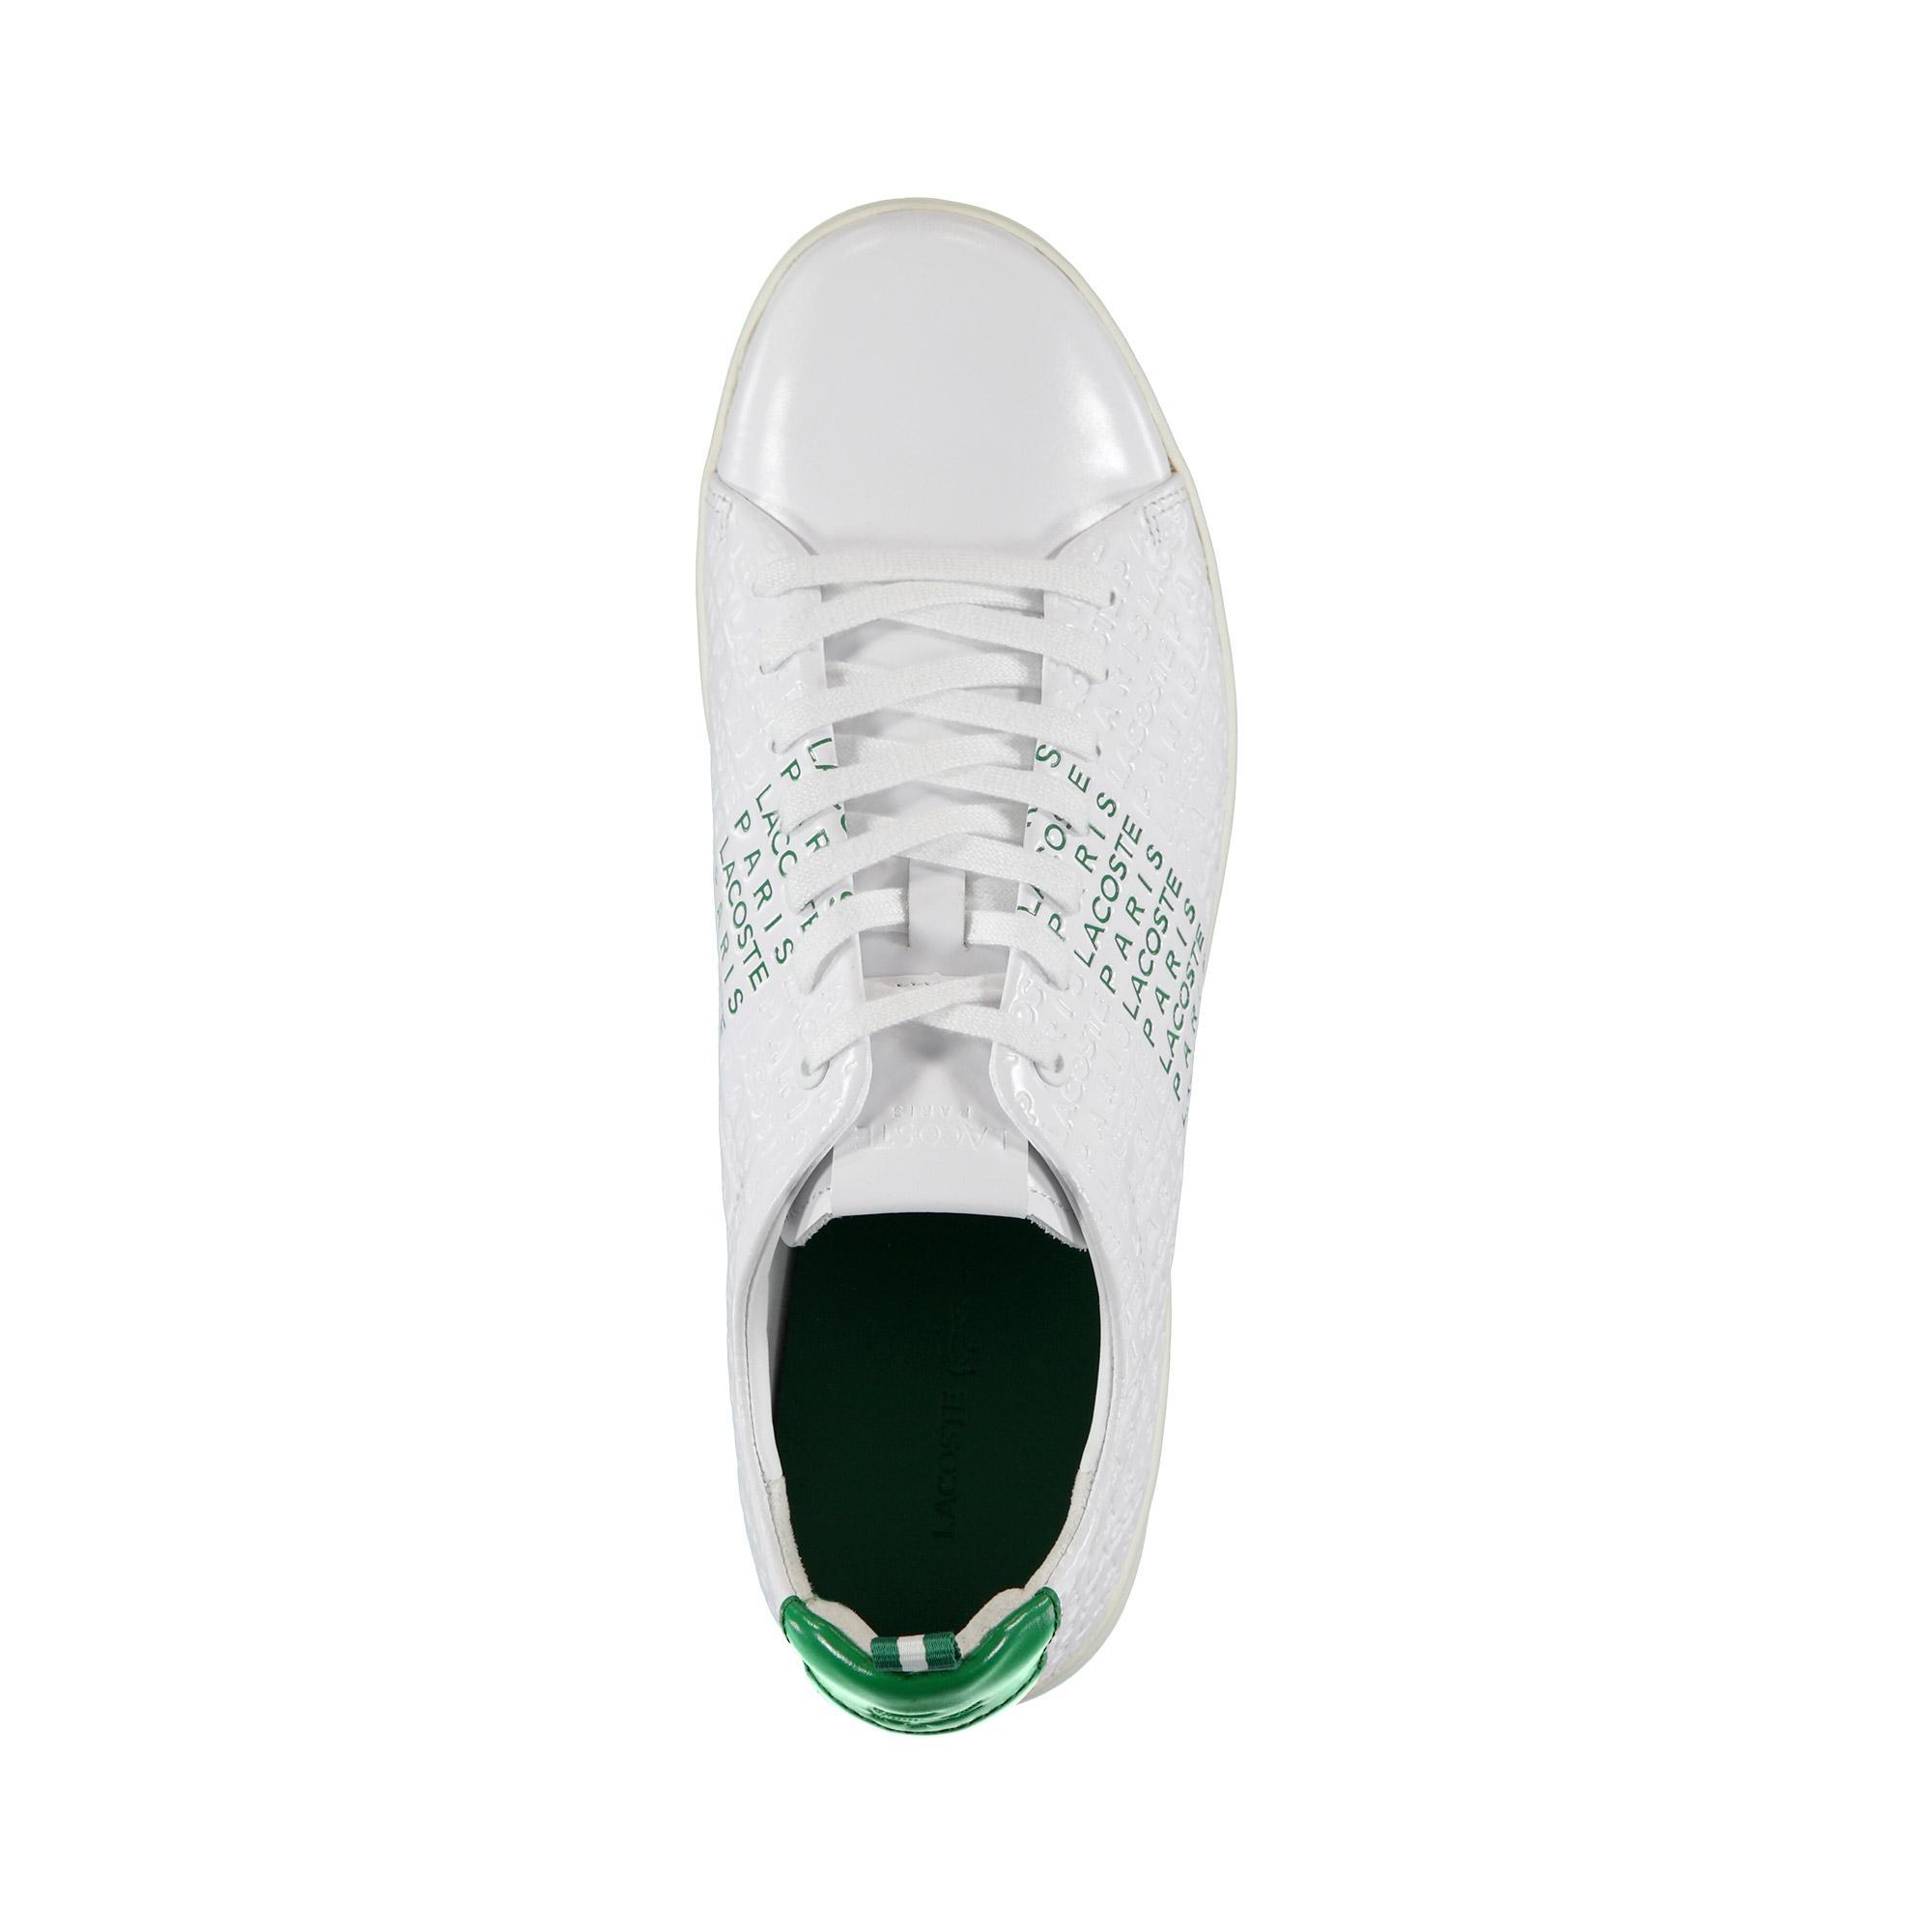 Lacoste Erkek Beyaz - Yeşil Carnaby Evo 119 9 Us Sneaker